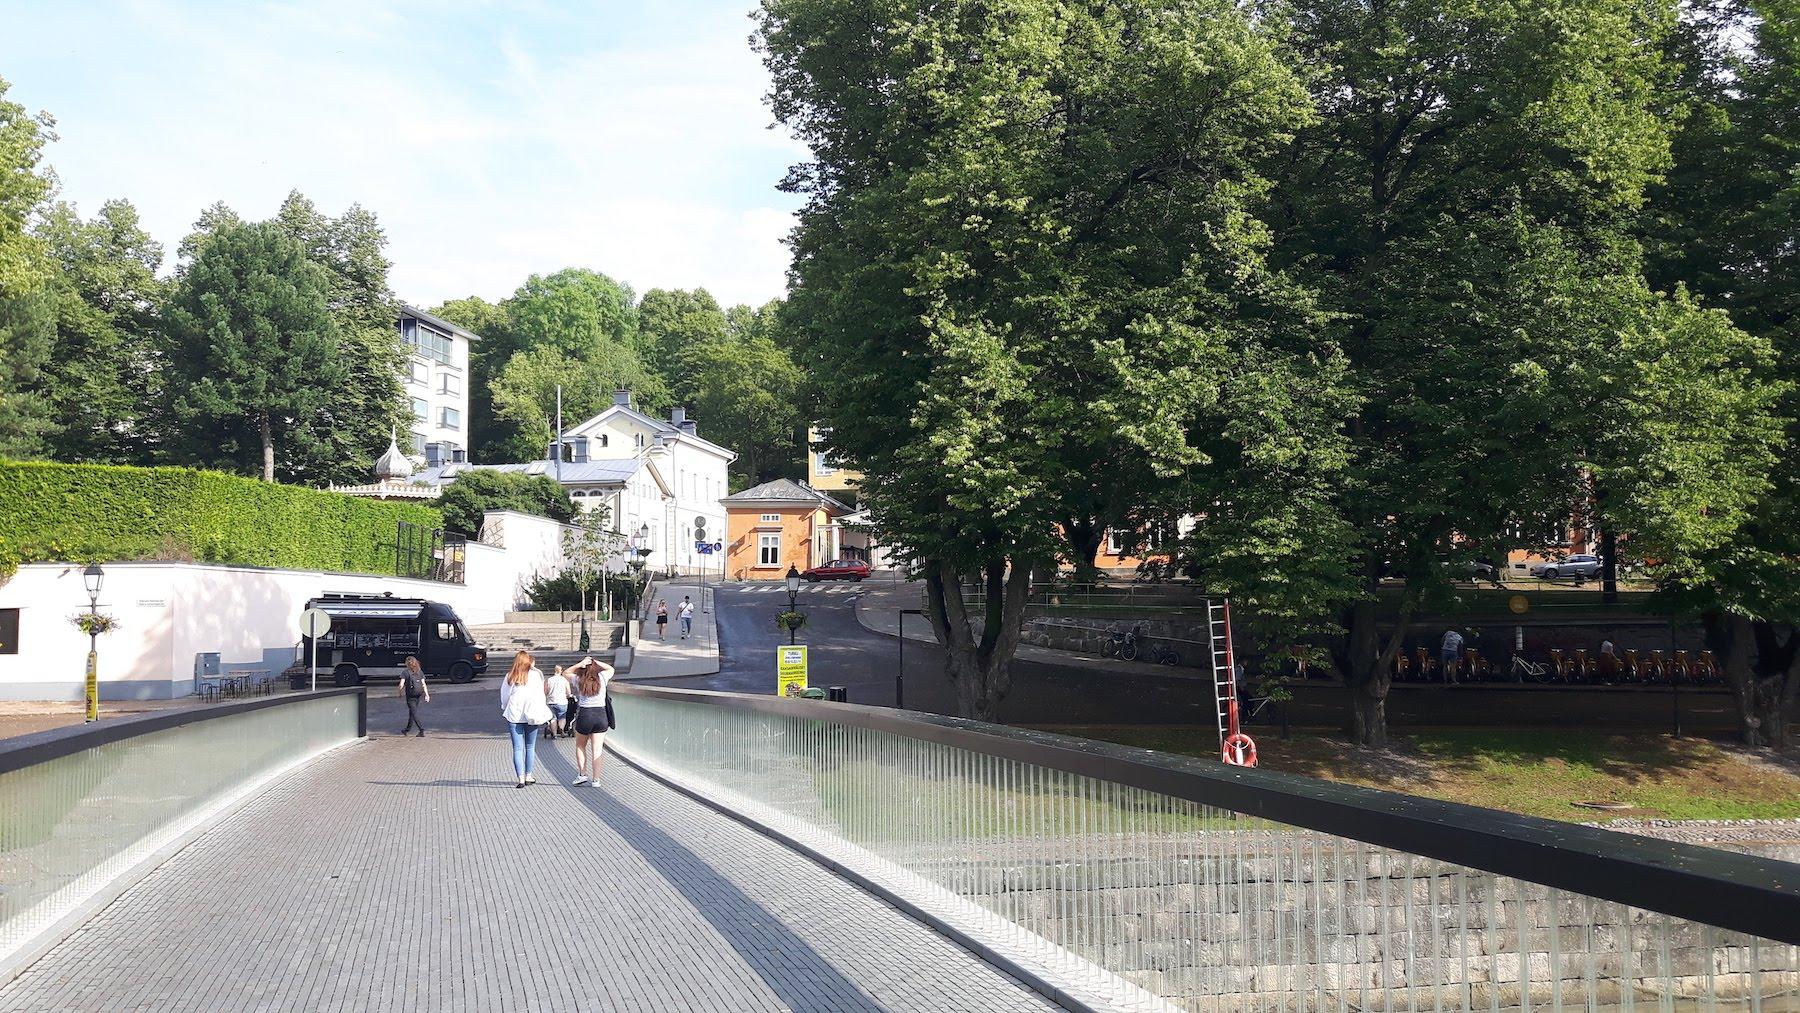 City View Turku Finland